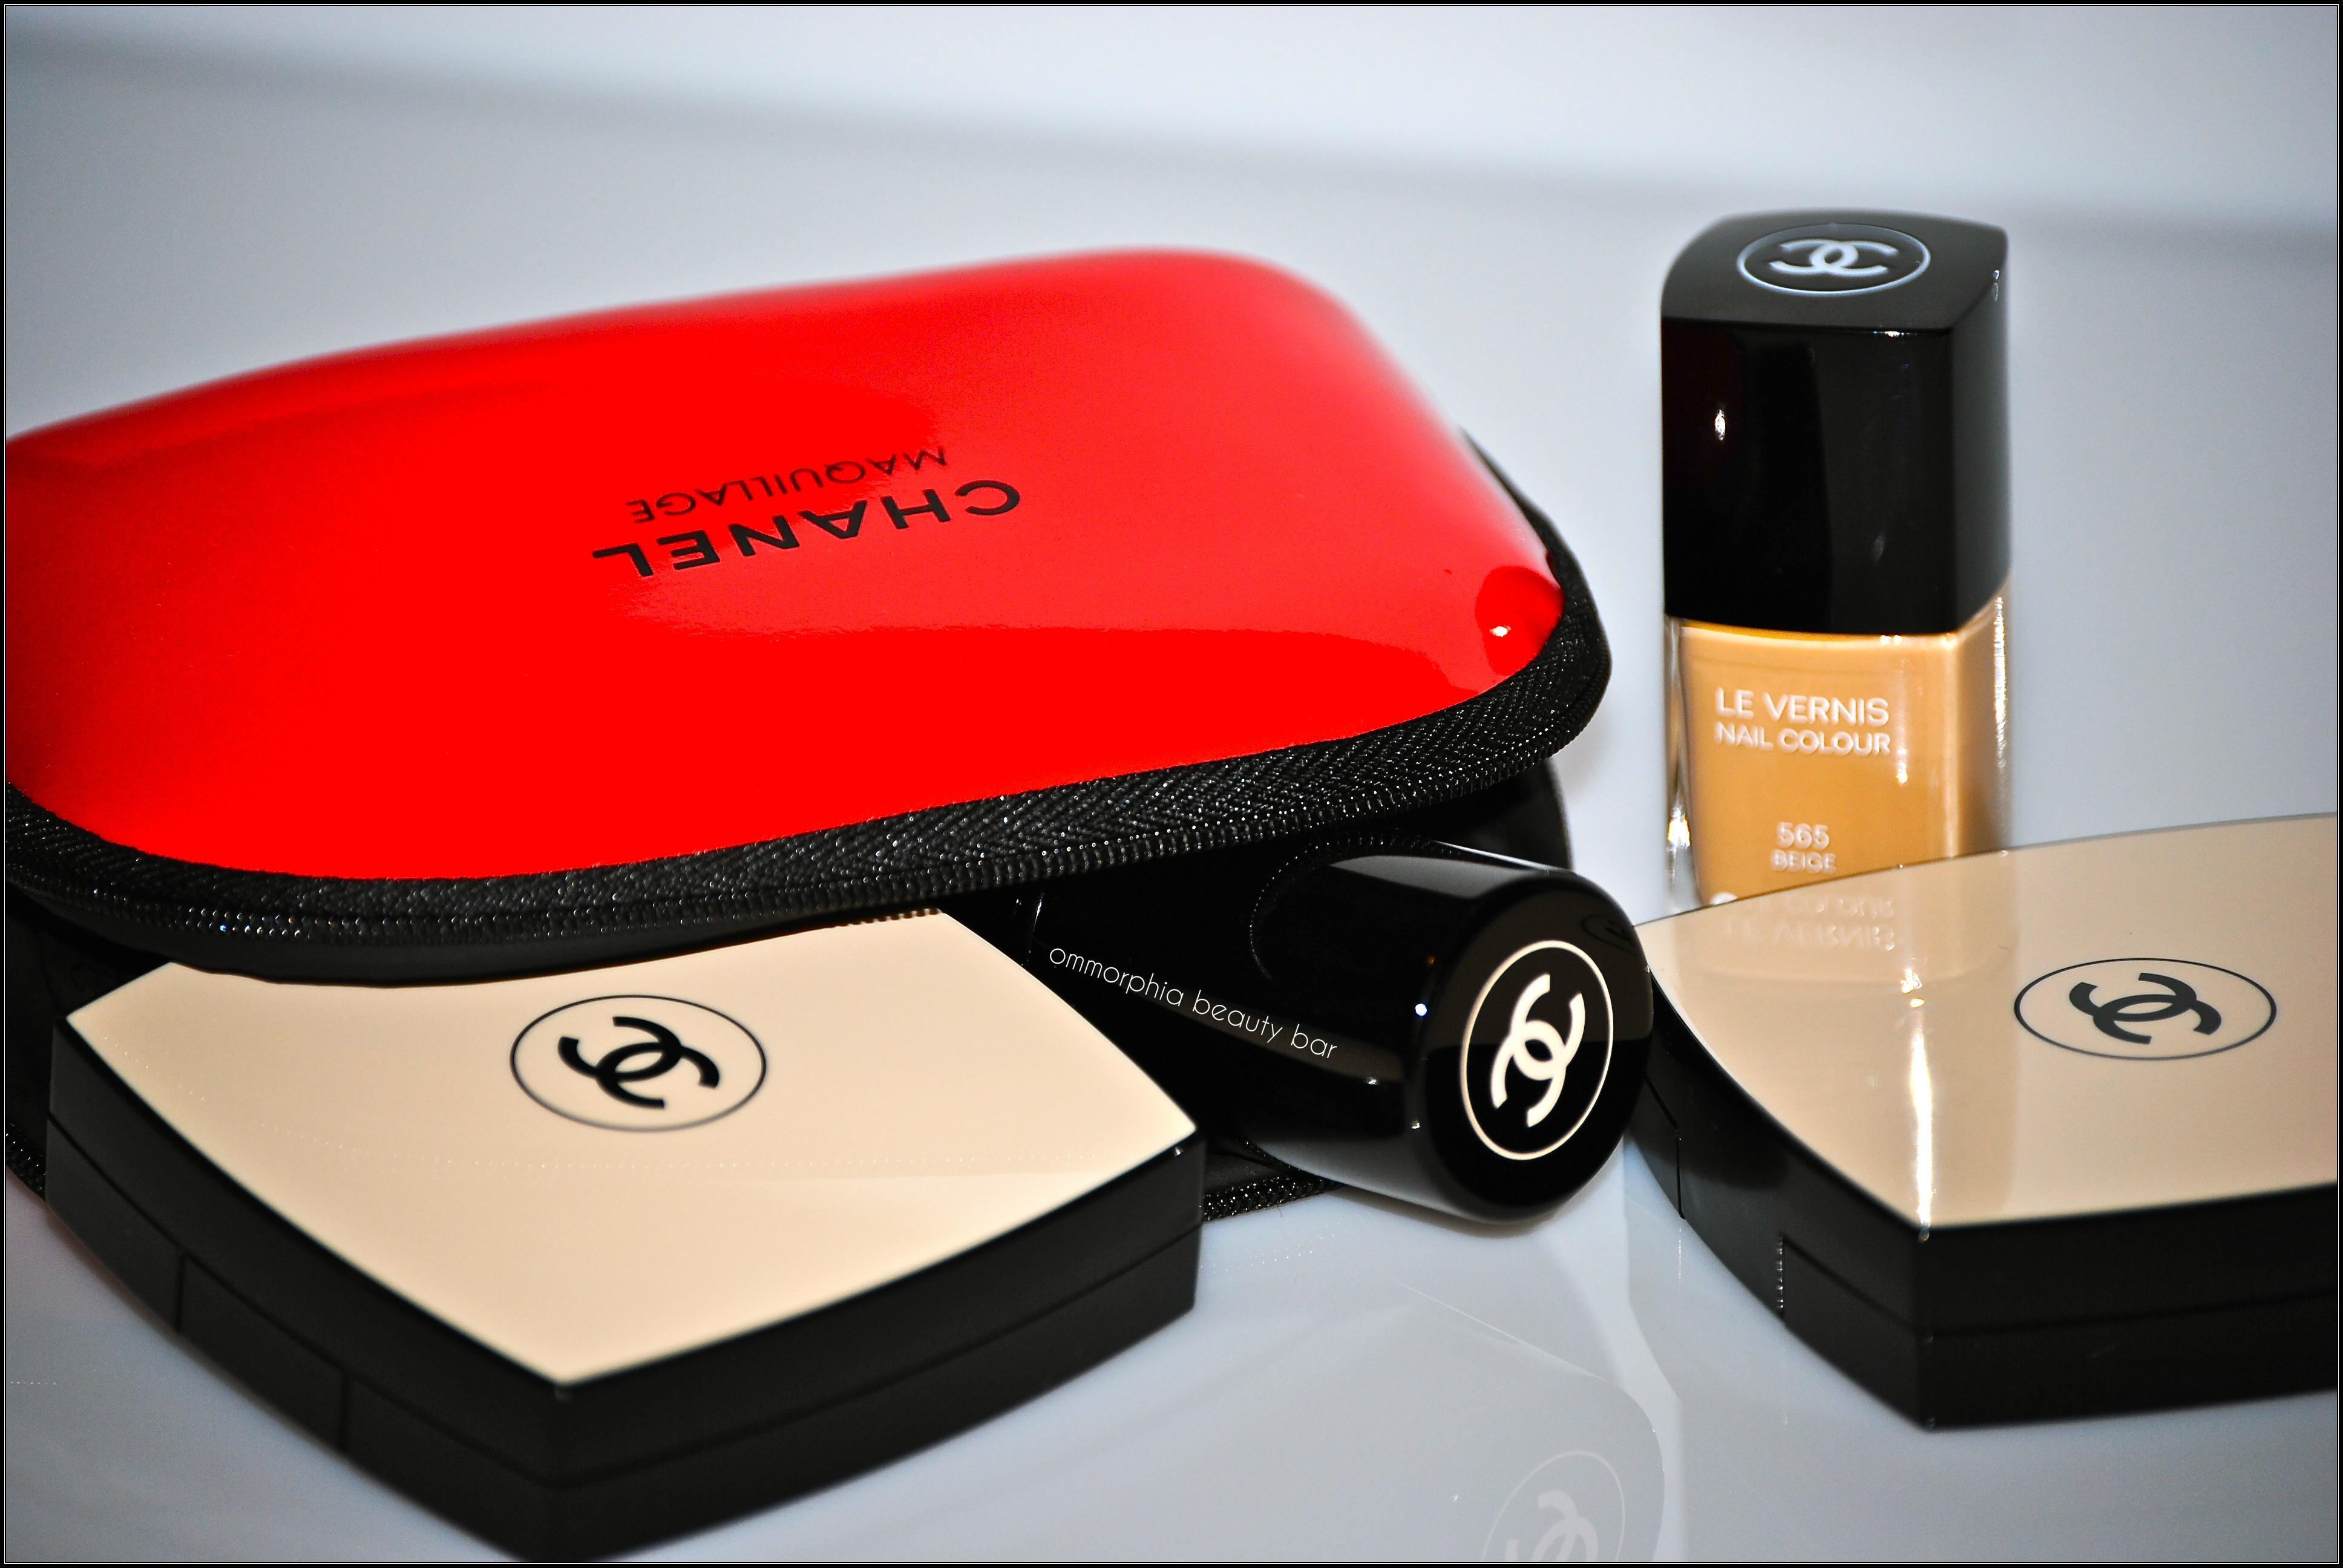 Chanel Makeup Bag chanel les beiges #20 review ommorphia beauty bar